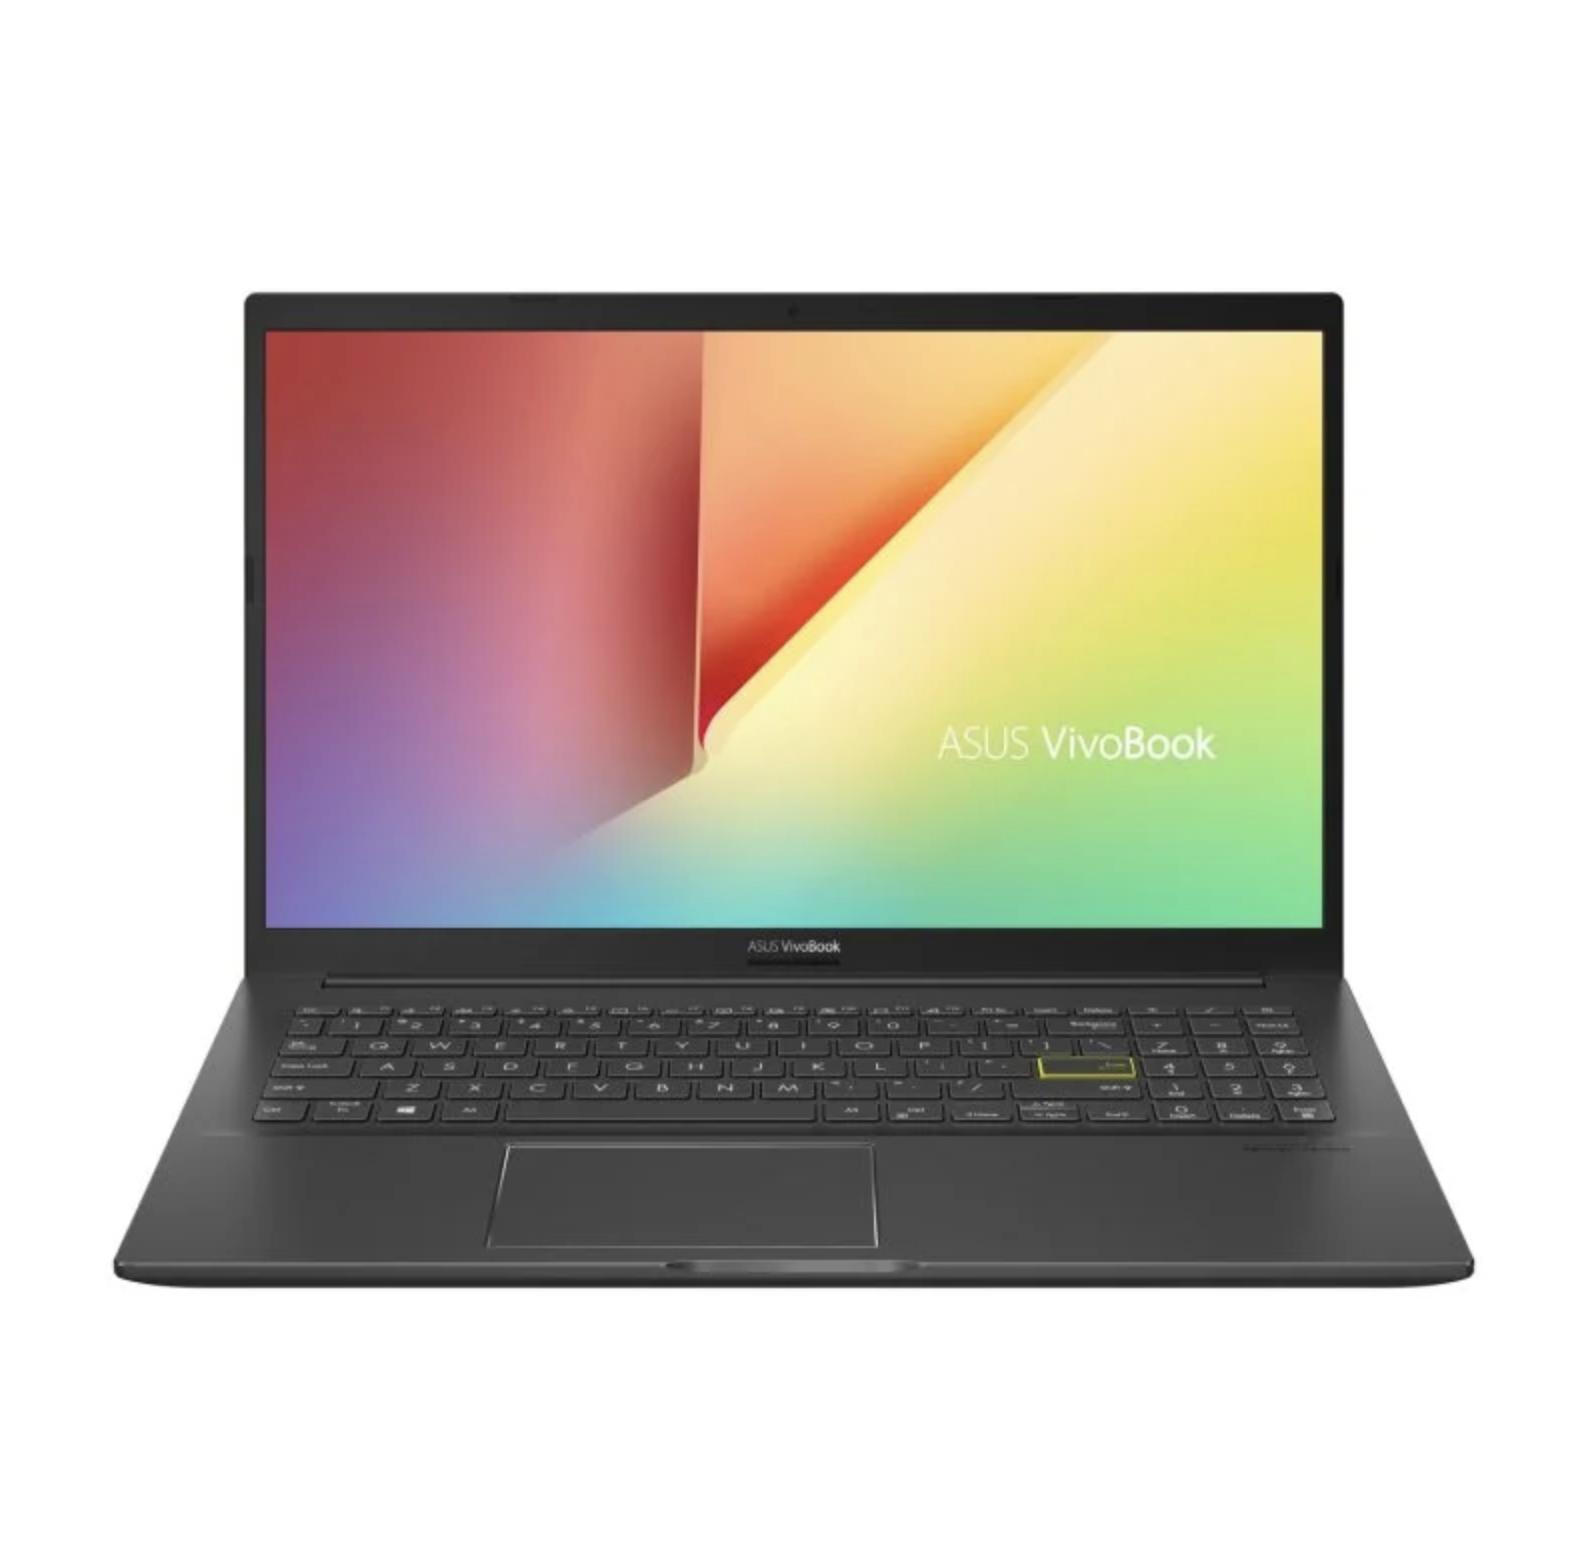 ASUS VivoBook 15 K513EA BQ158 Intel Core I5 1135G7 8GB 512GB SSD 156